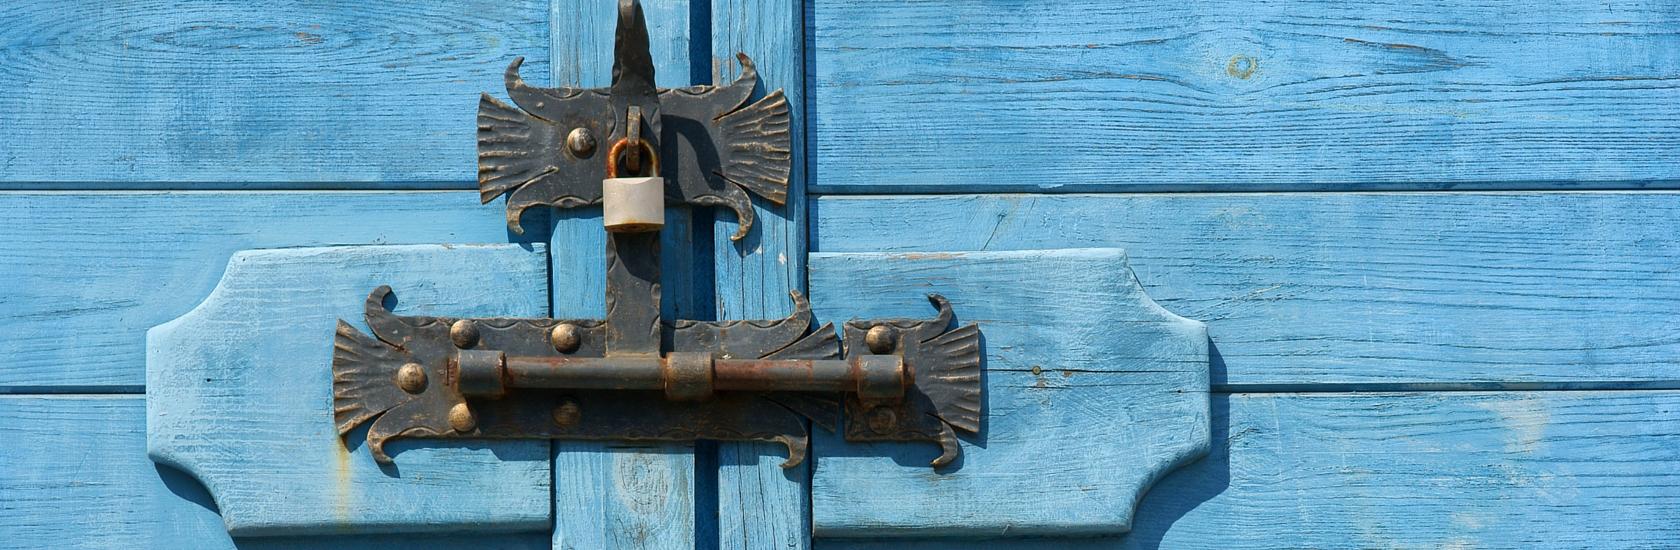 website maintenance, www.puzzleboxcommunications.com